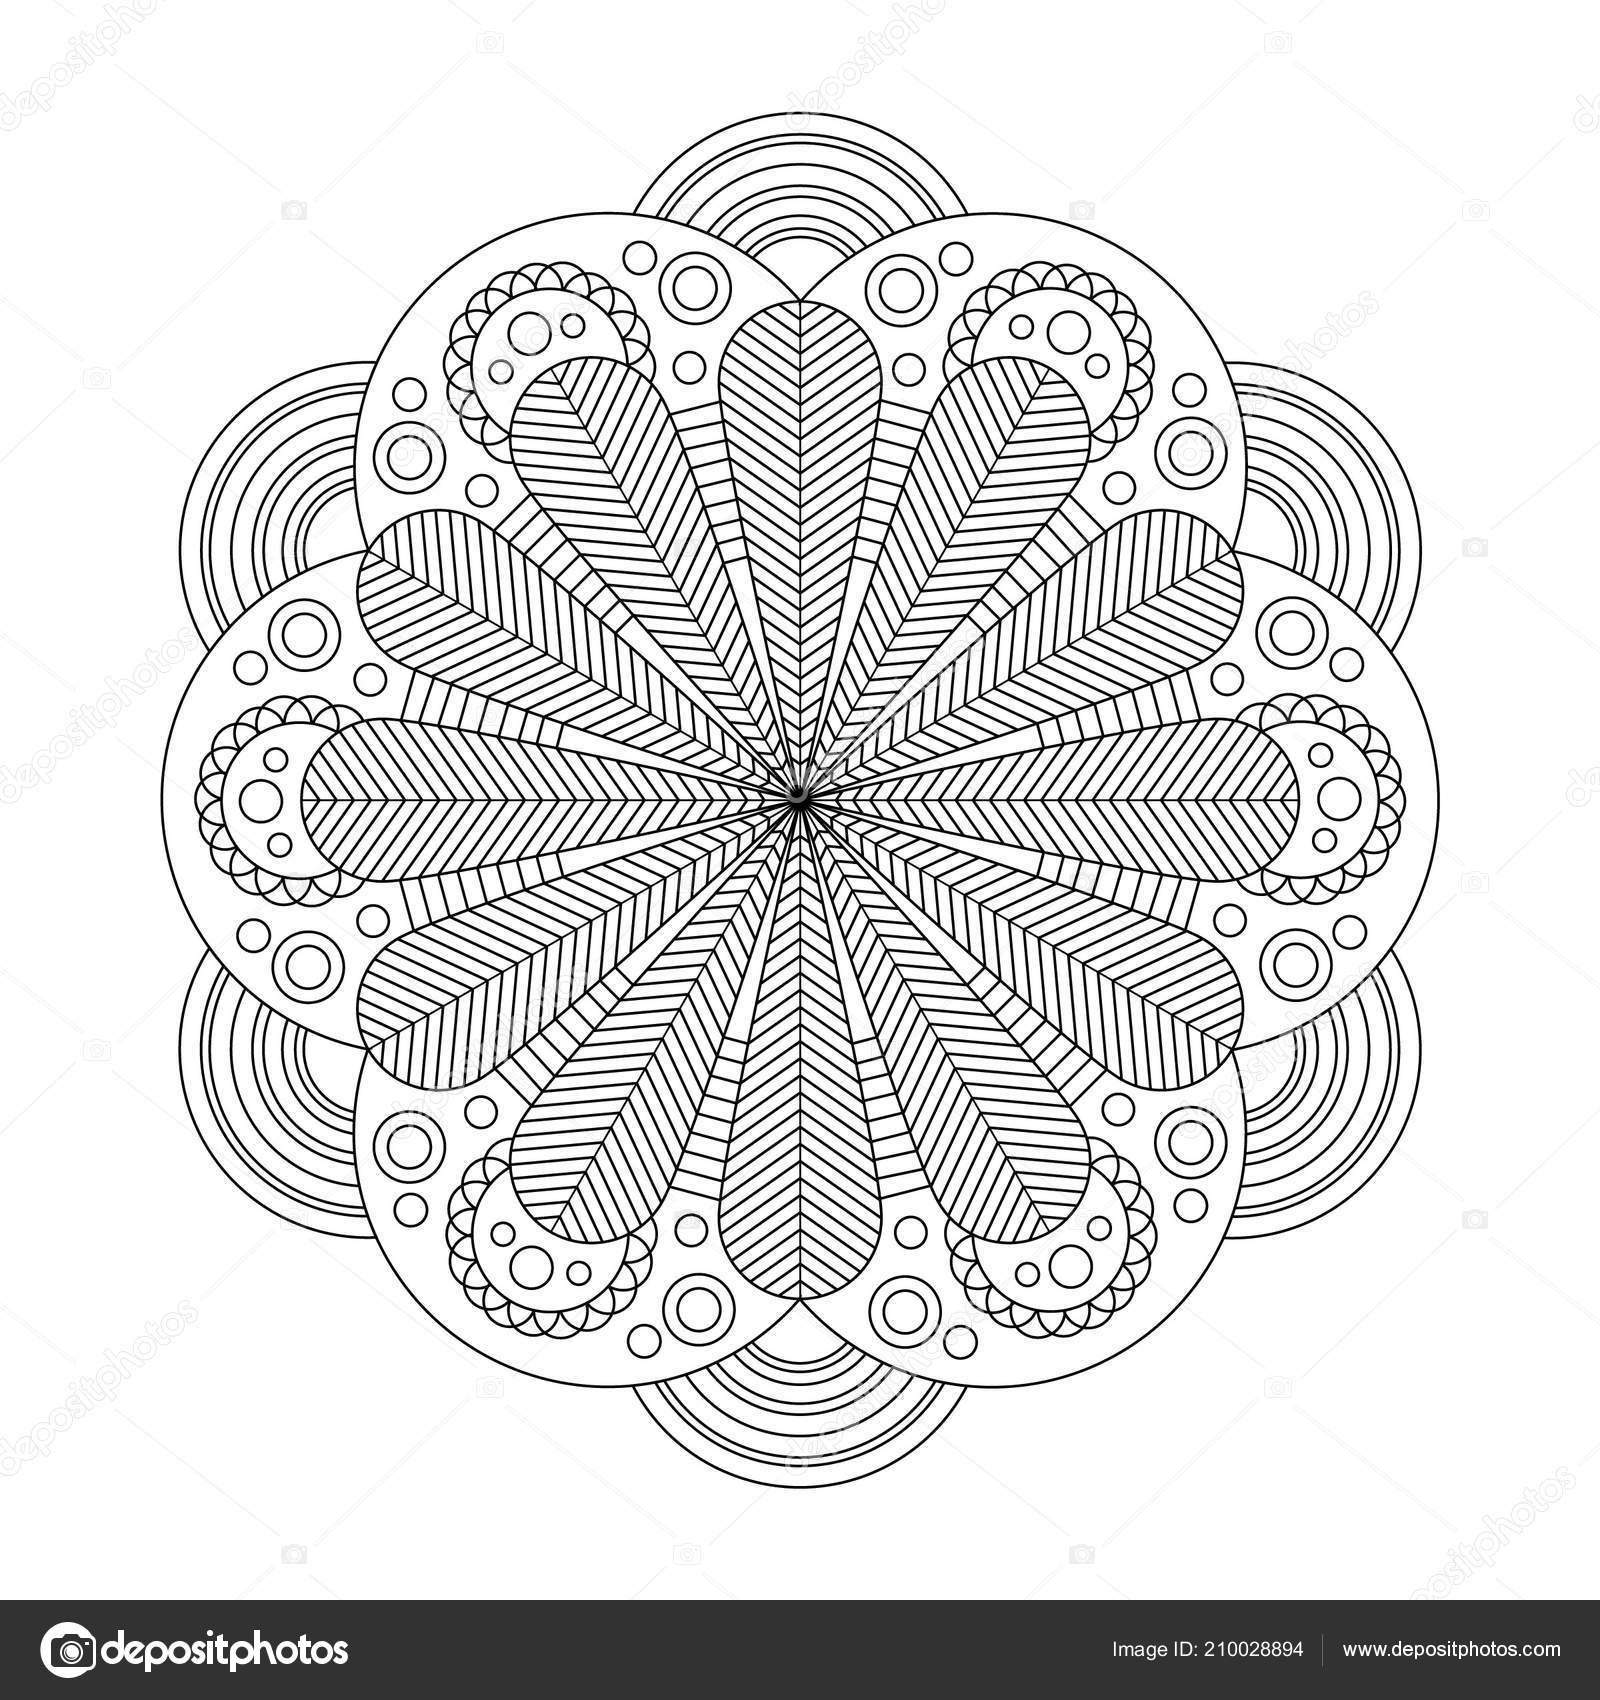 Mandala Coloring Book Seite Kunst Therapie Vintage Deko Elemente ...